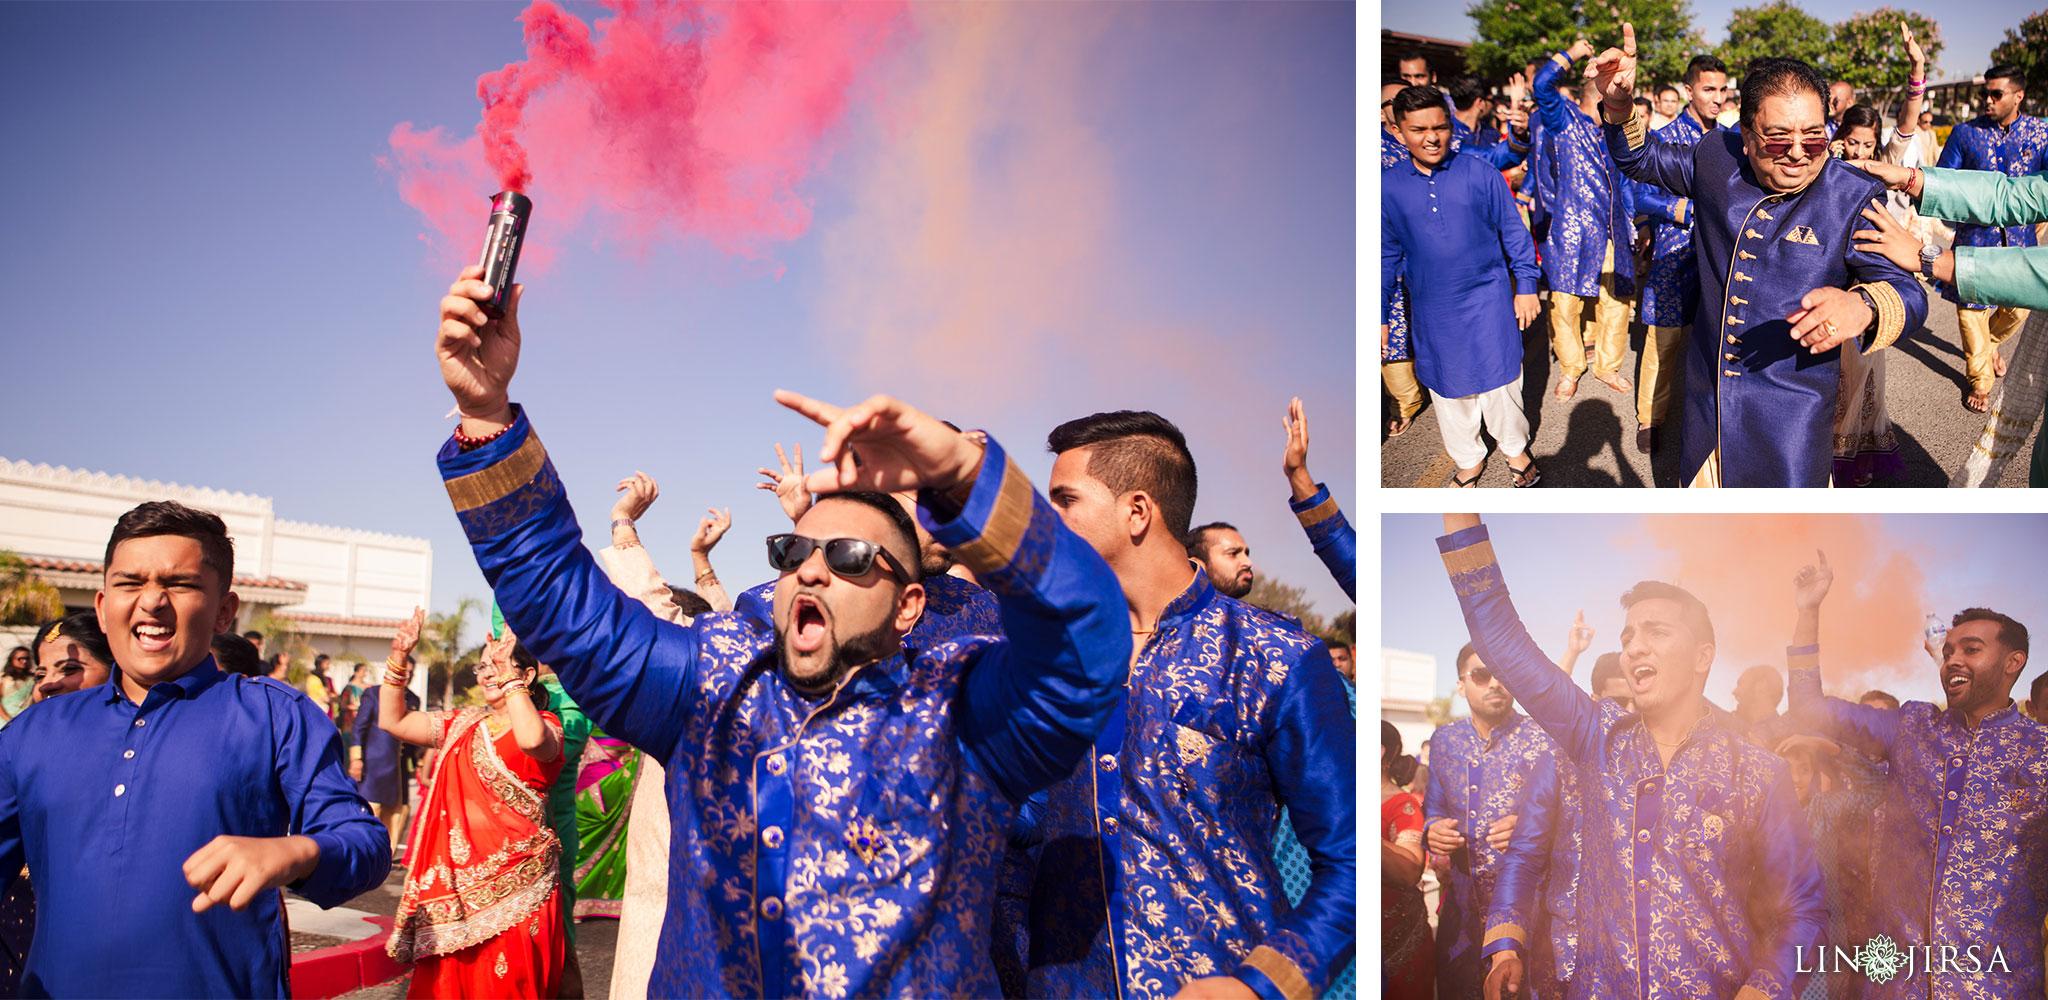 078 BAPS Swaminarayan Sanstha Chino Hills Indian Wedding Photography